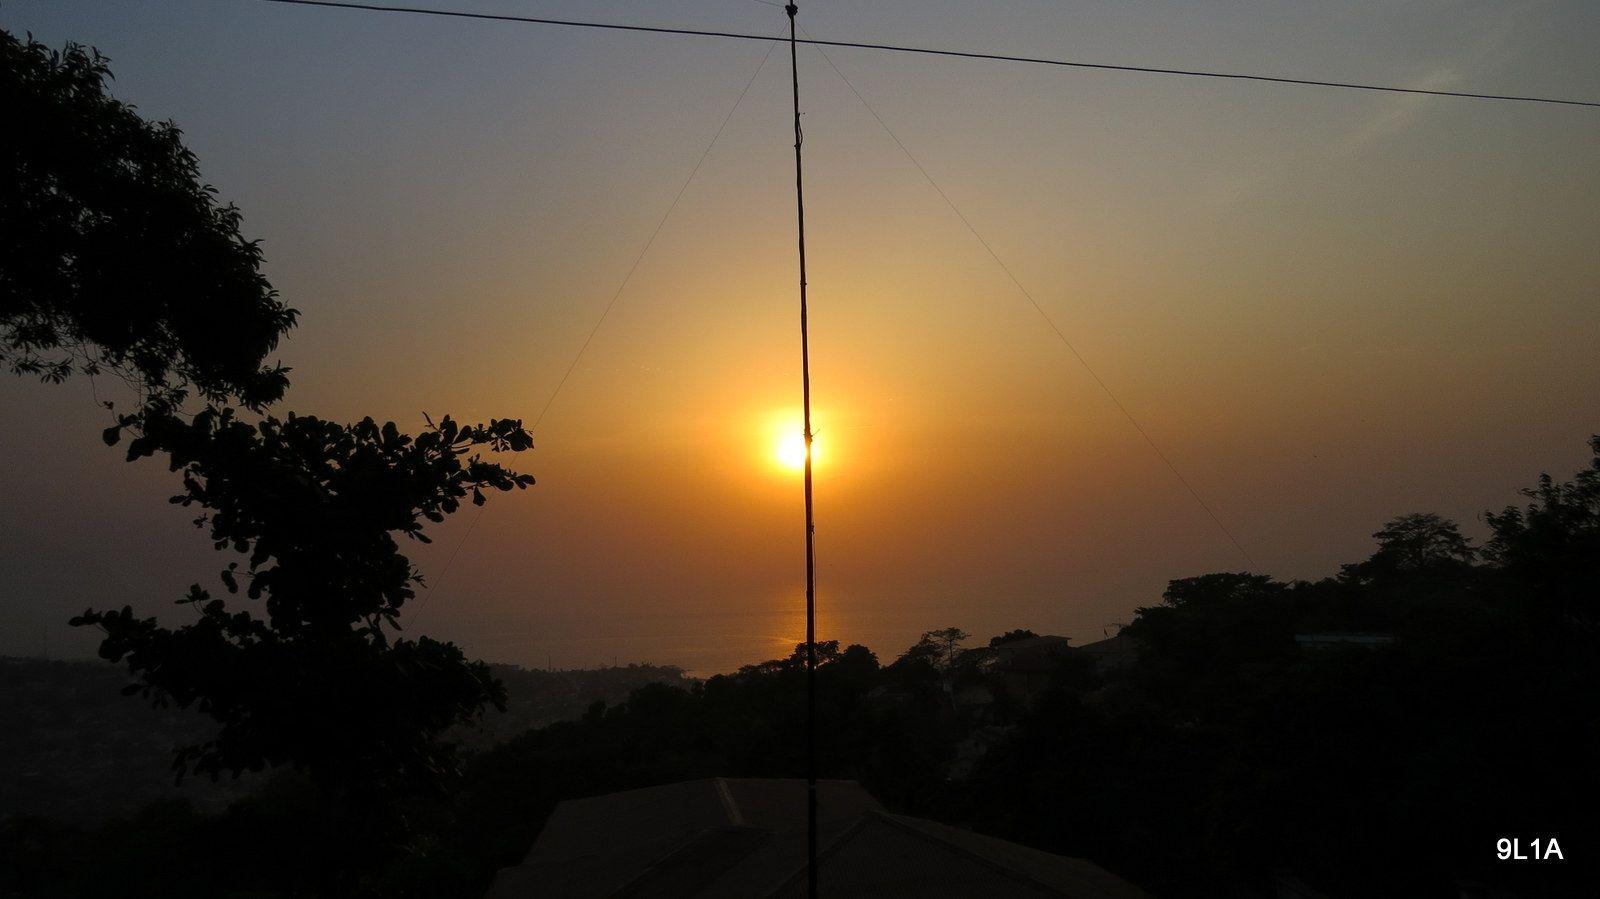 Sierra Leone 9L1A News Antenna 3